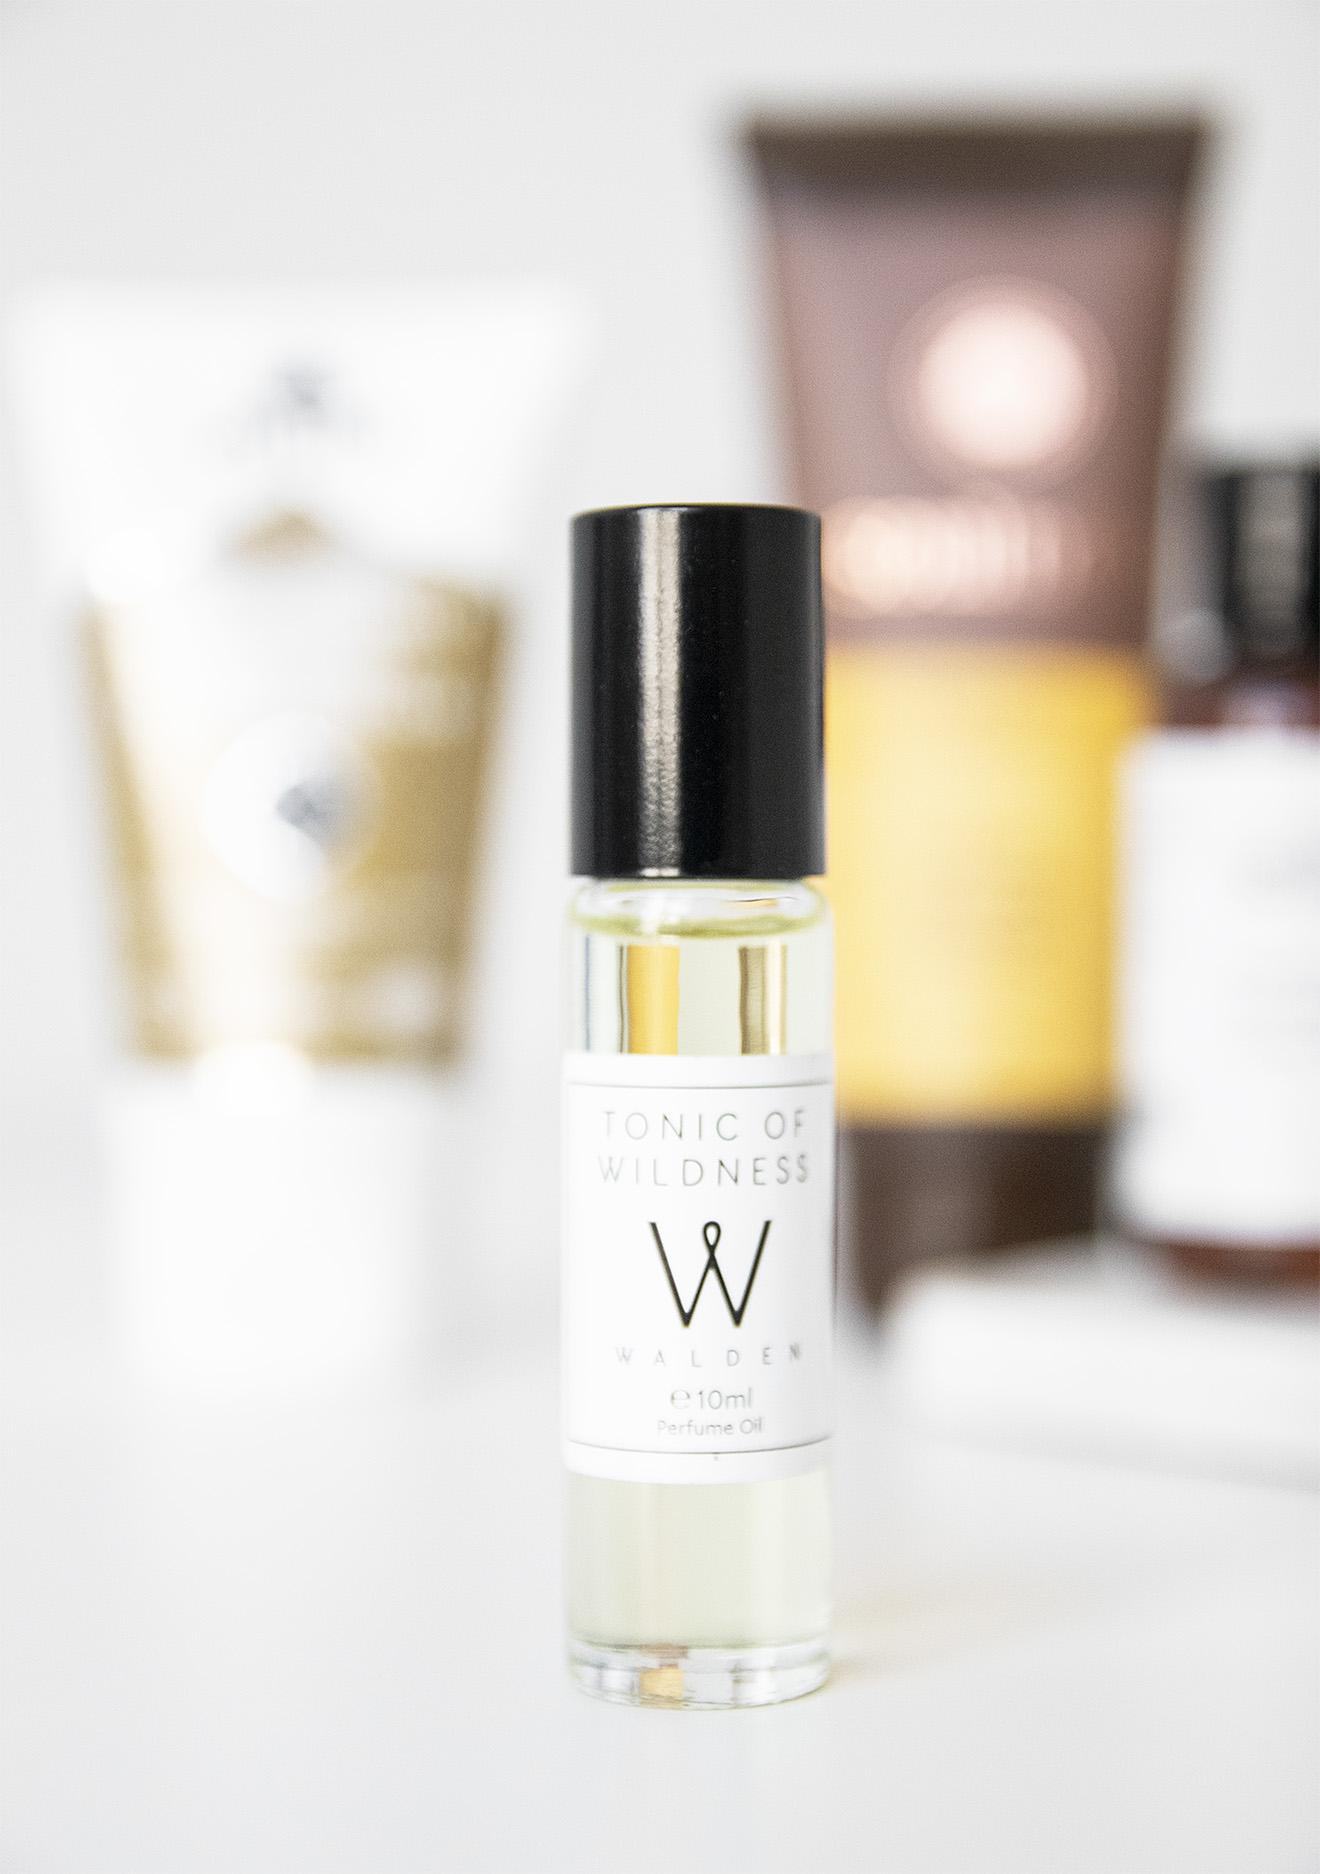 Walden Perfume Tonic Of Wildness